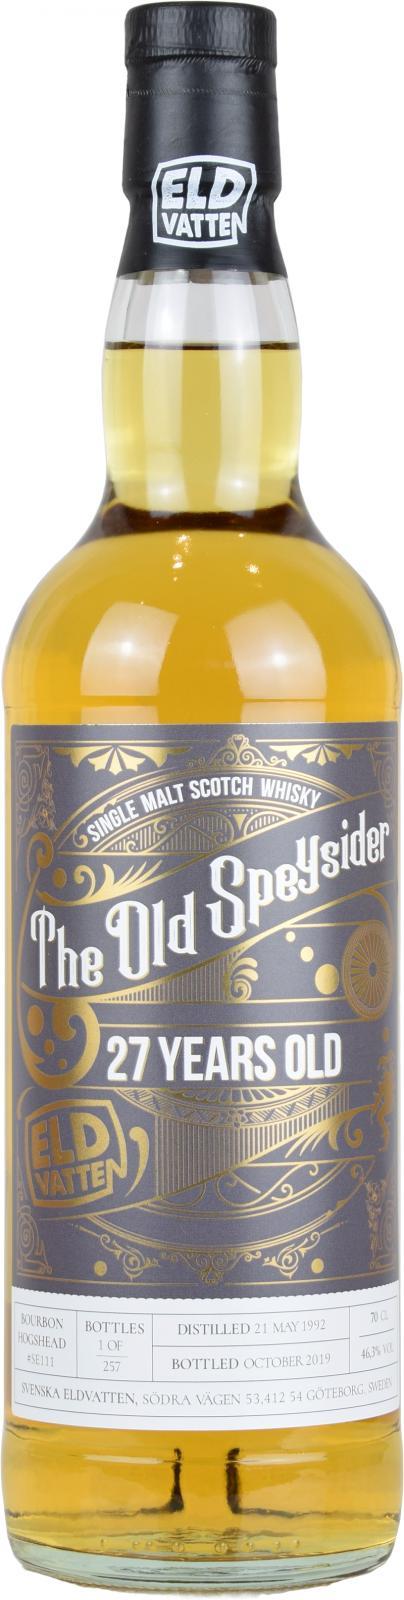 The Old Speysider 1992 SE